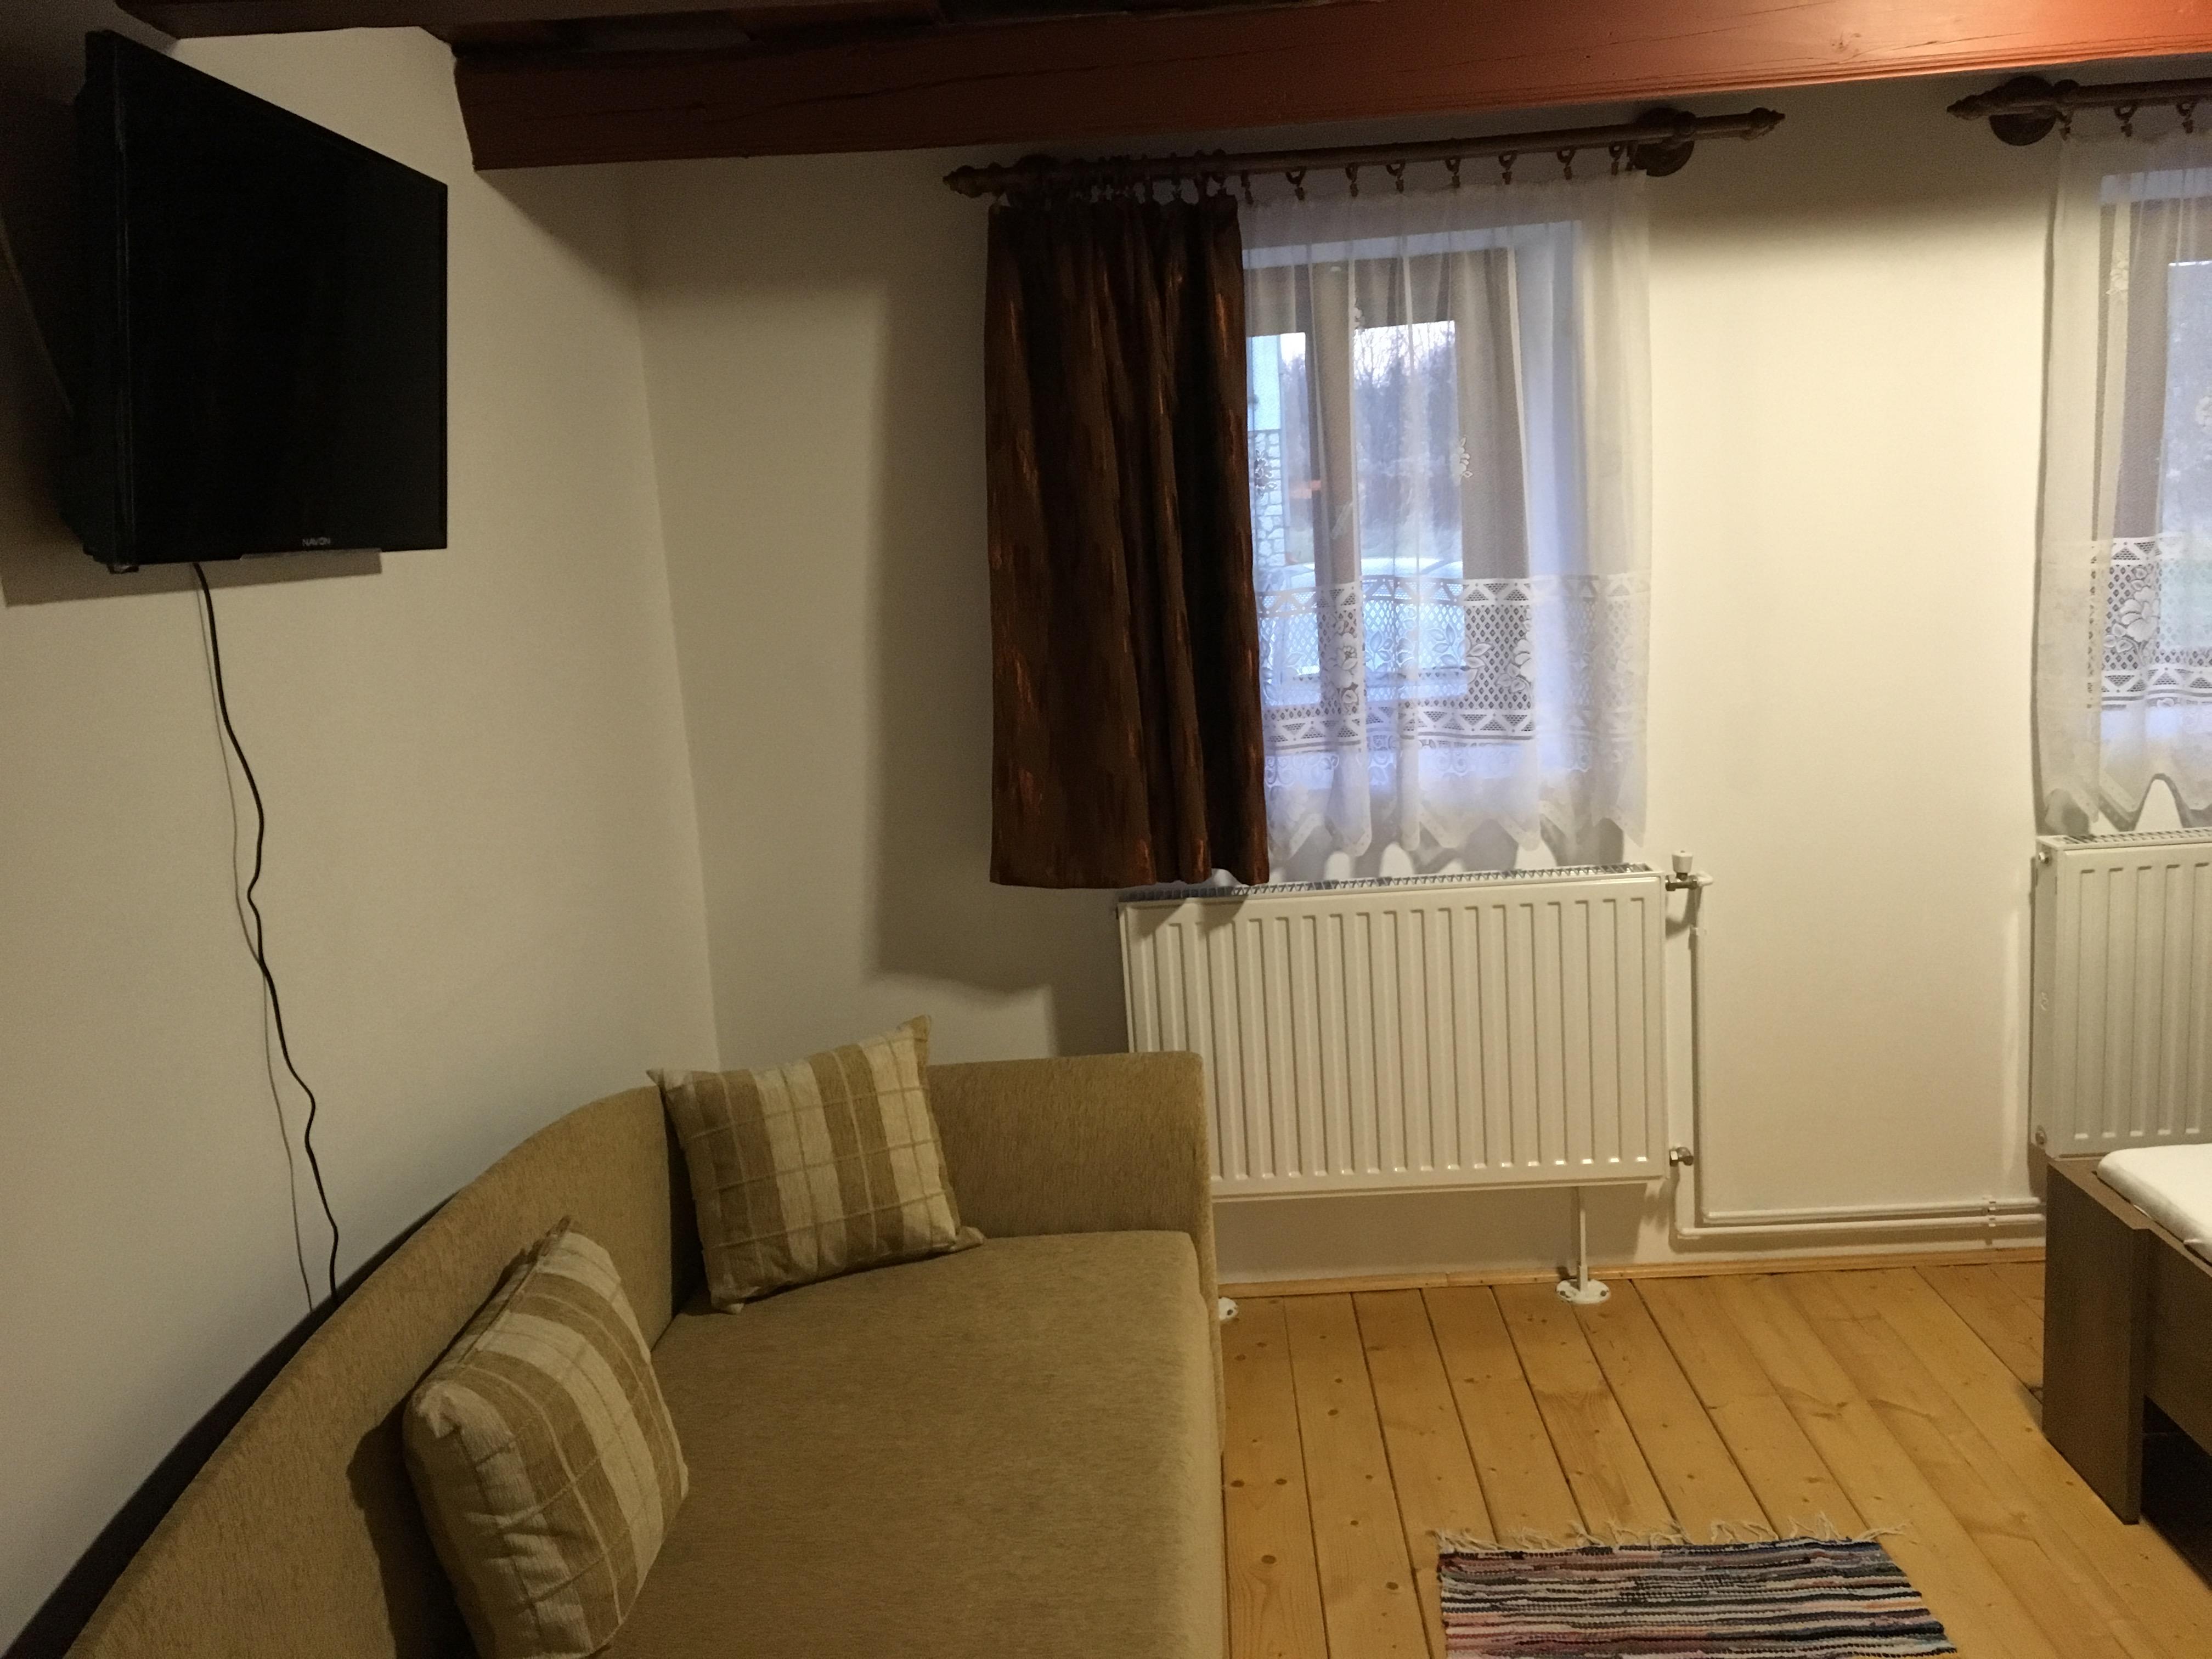 deko ideen schlafzimmer. Black Bedroom Furniture Sets. Home Design Ideas